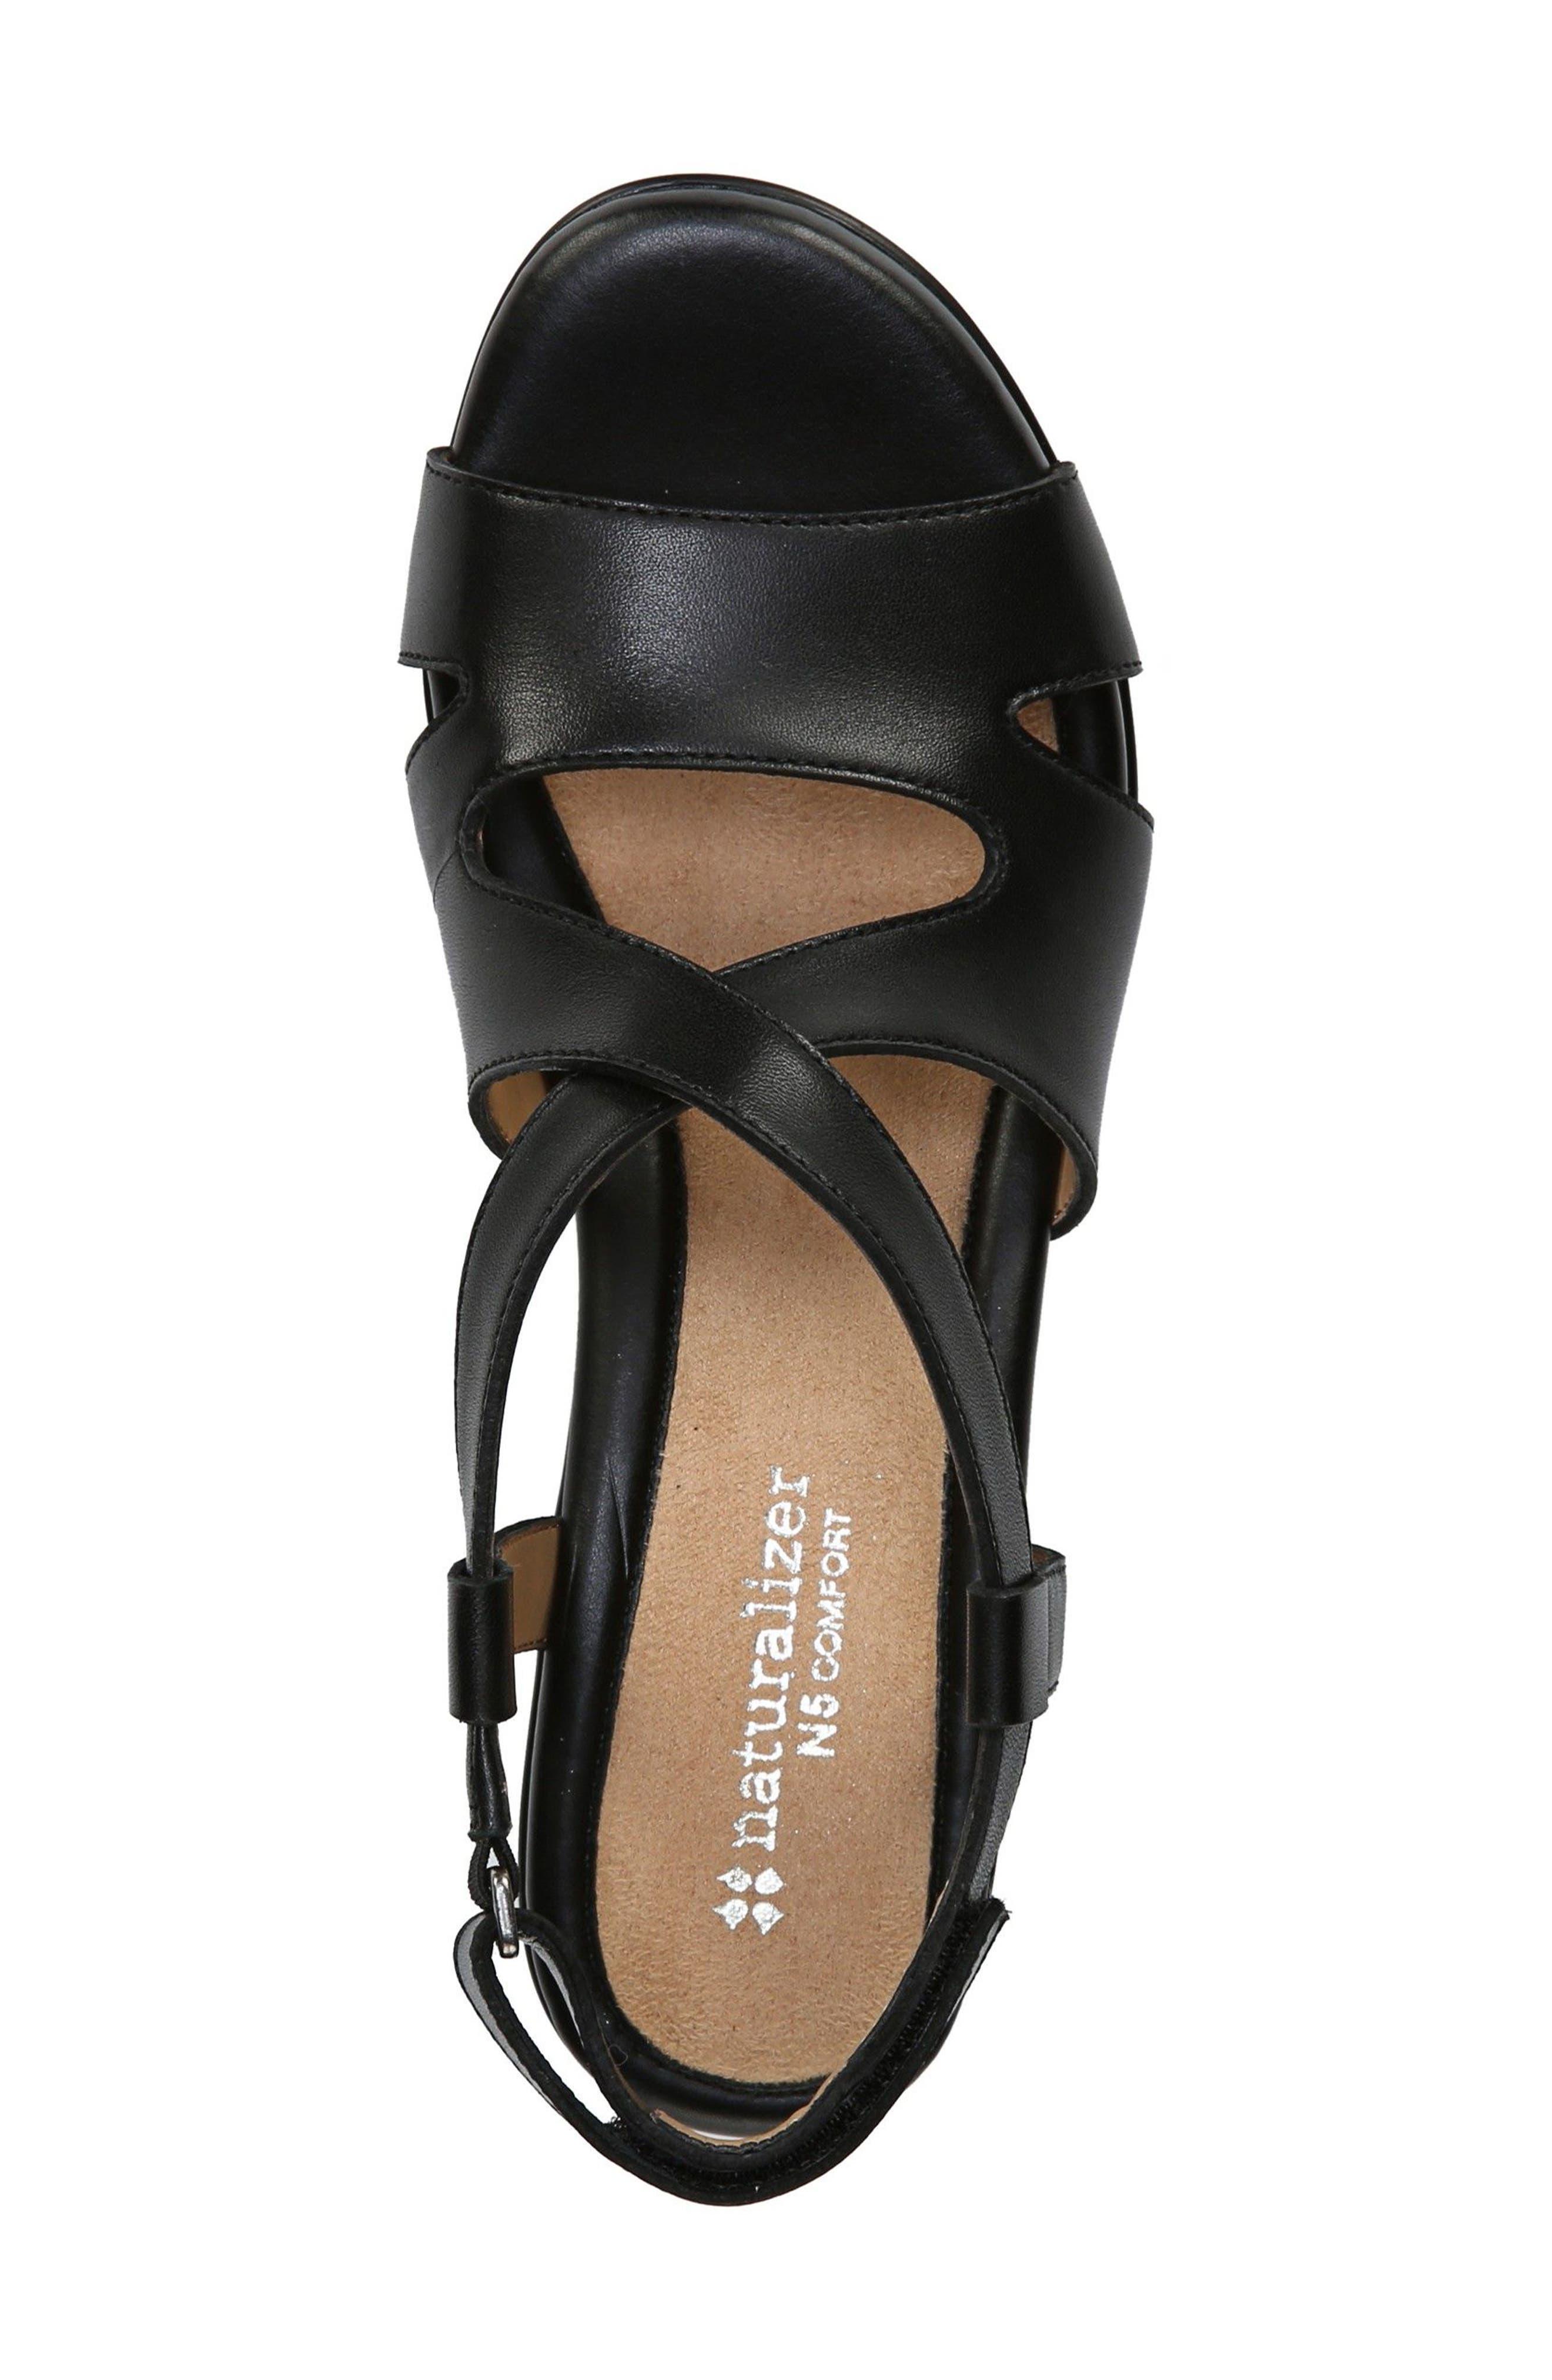 Vilette Wedge Sandal,                             Alternate thumbnail 3, color,                             Black Leather